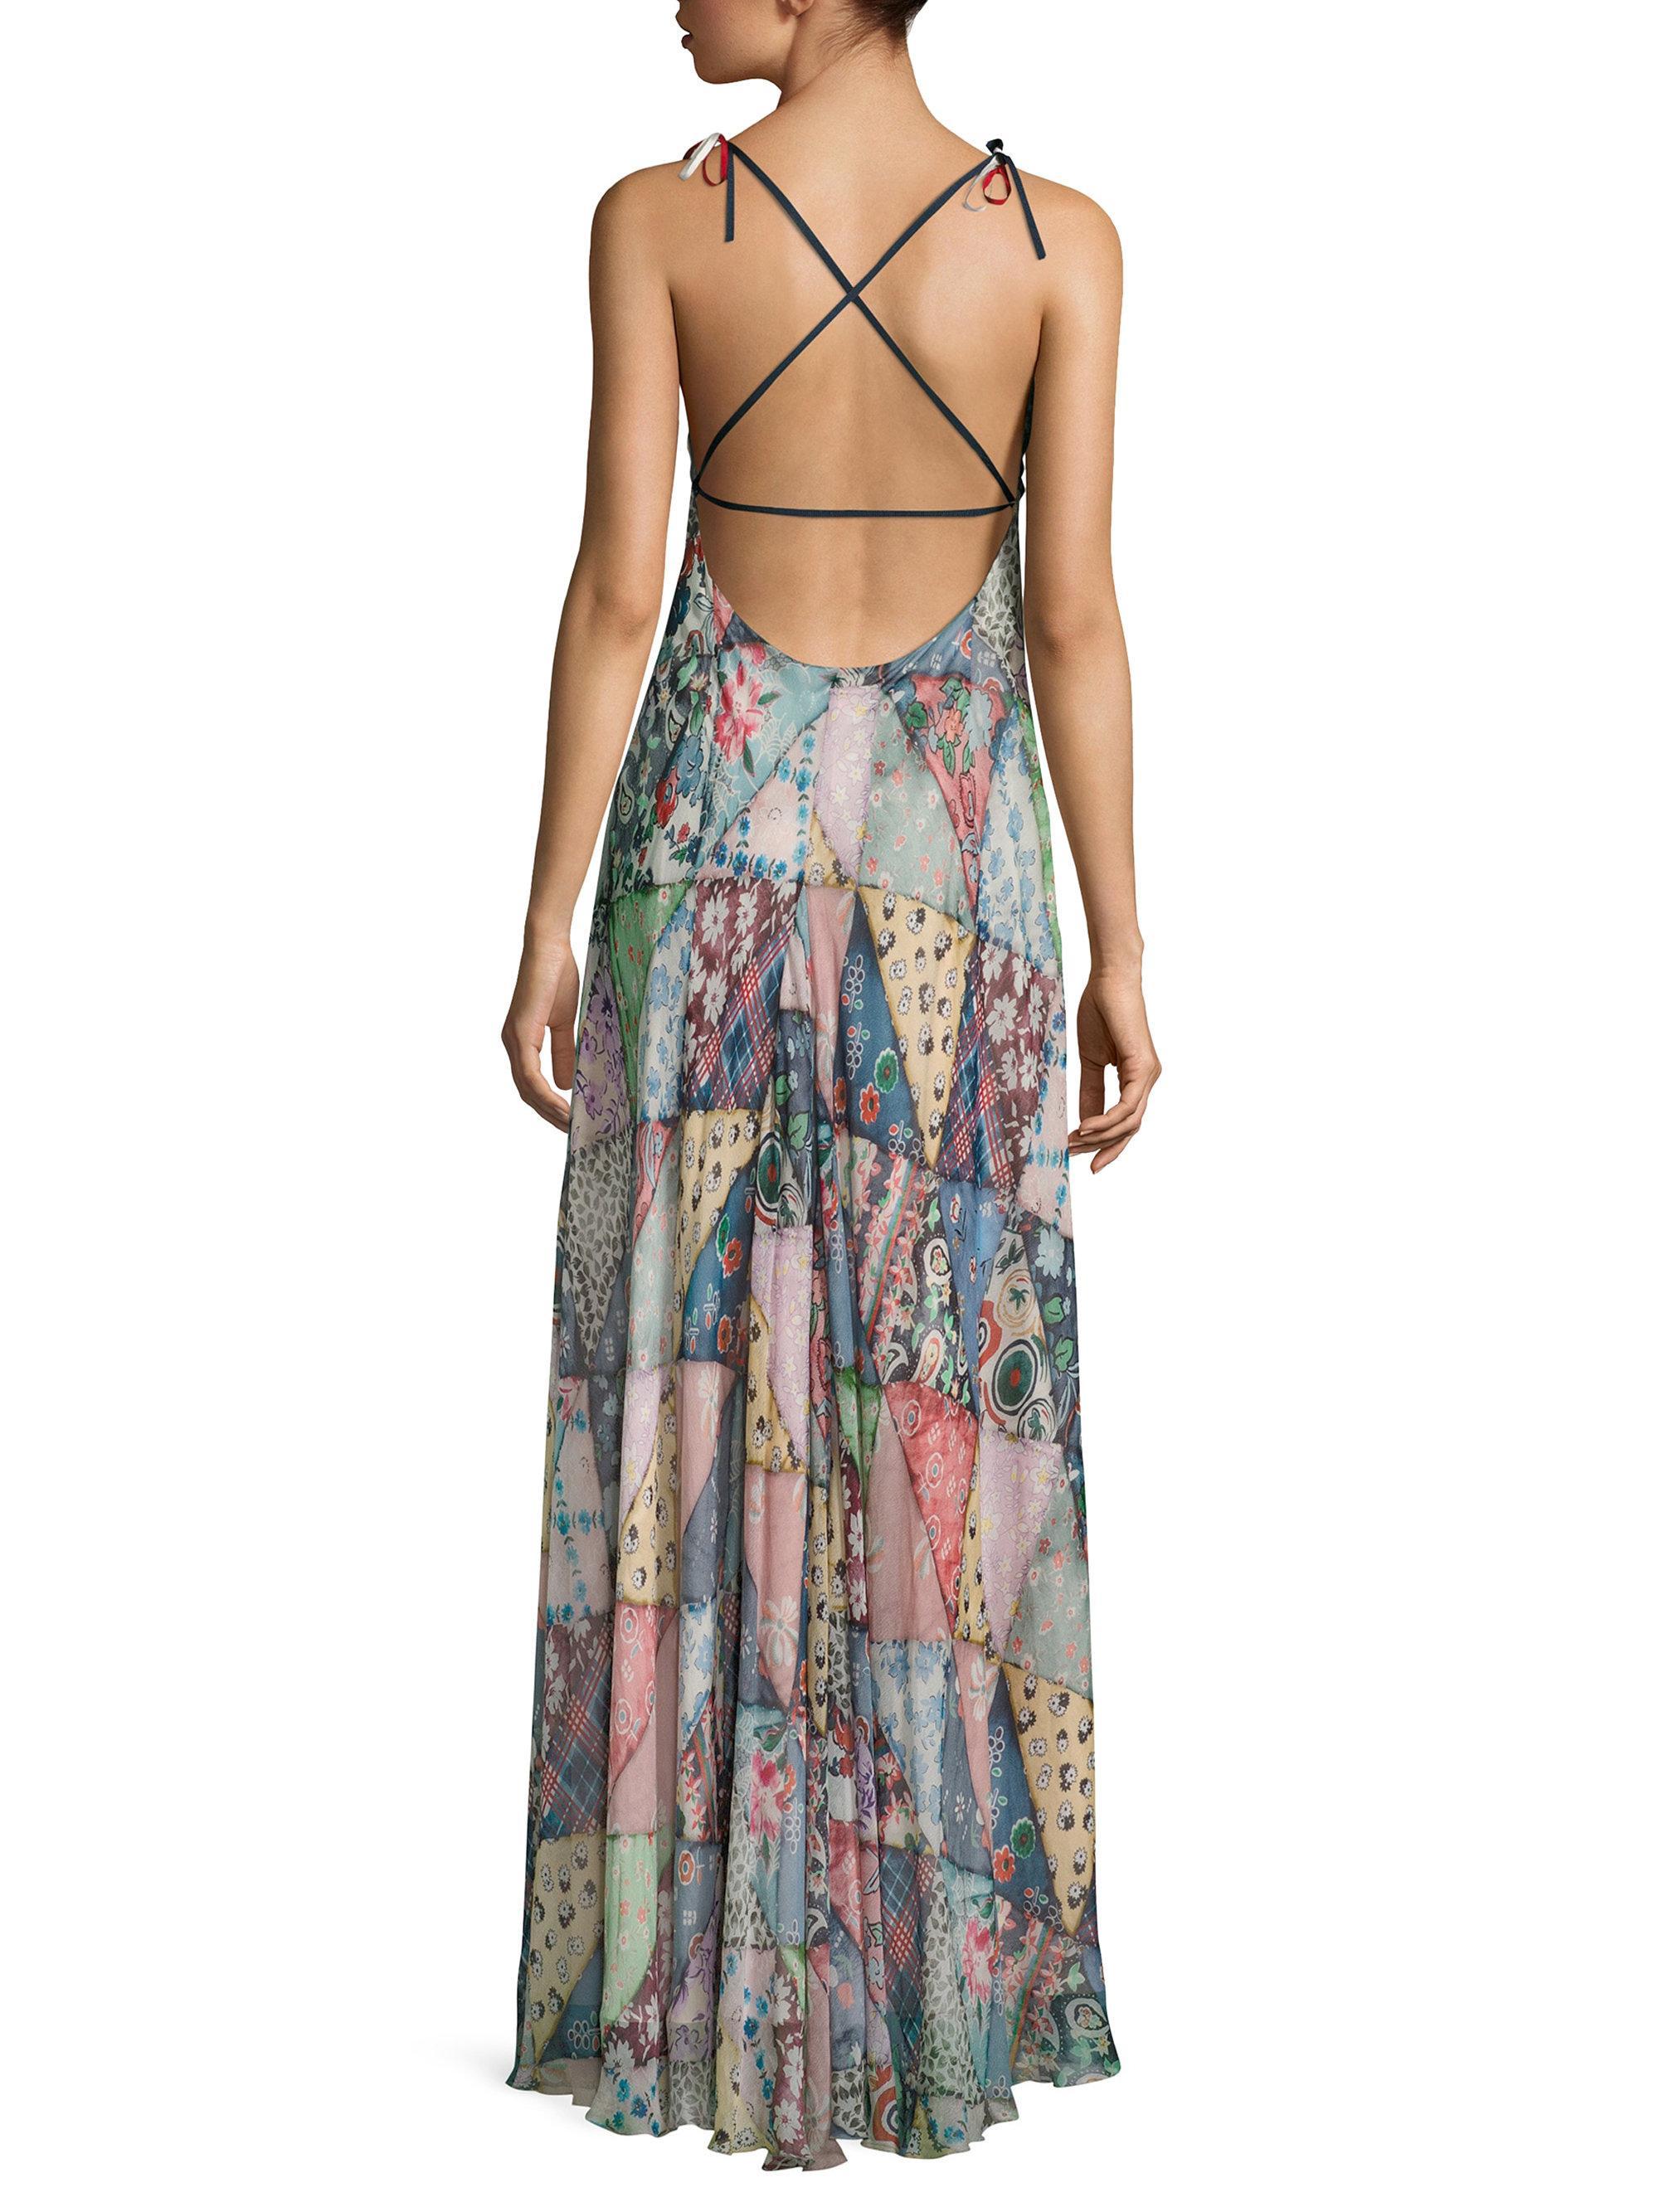 Lyst - Tommy Hilfiger Crossed Blanket Dress